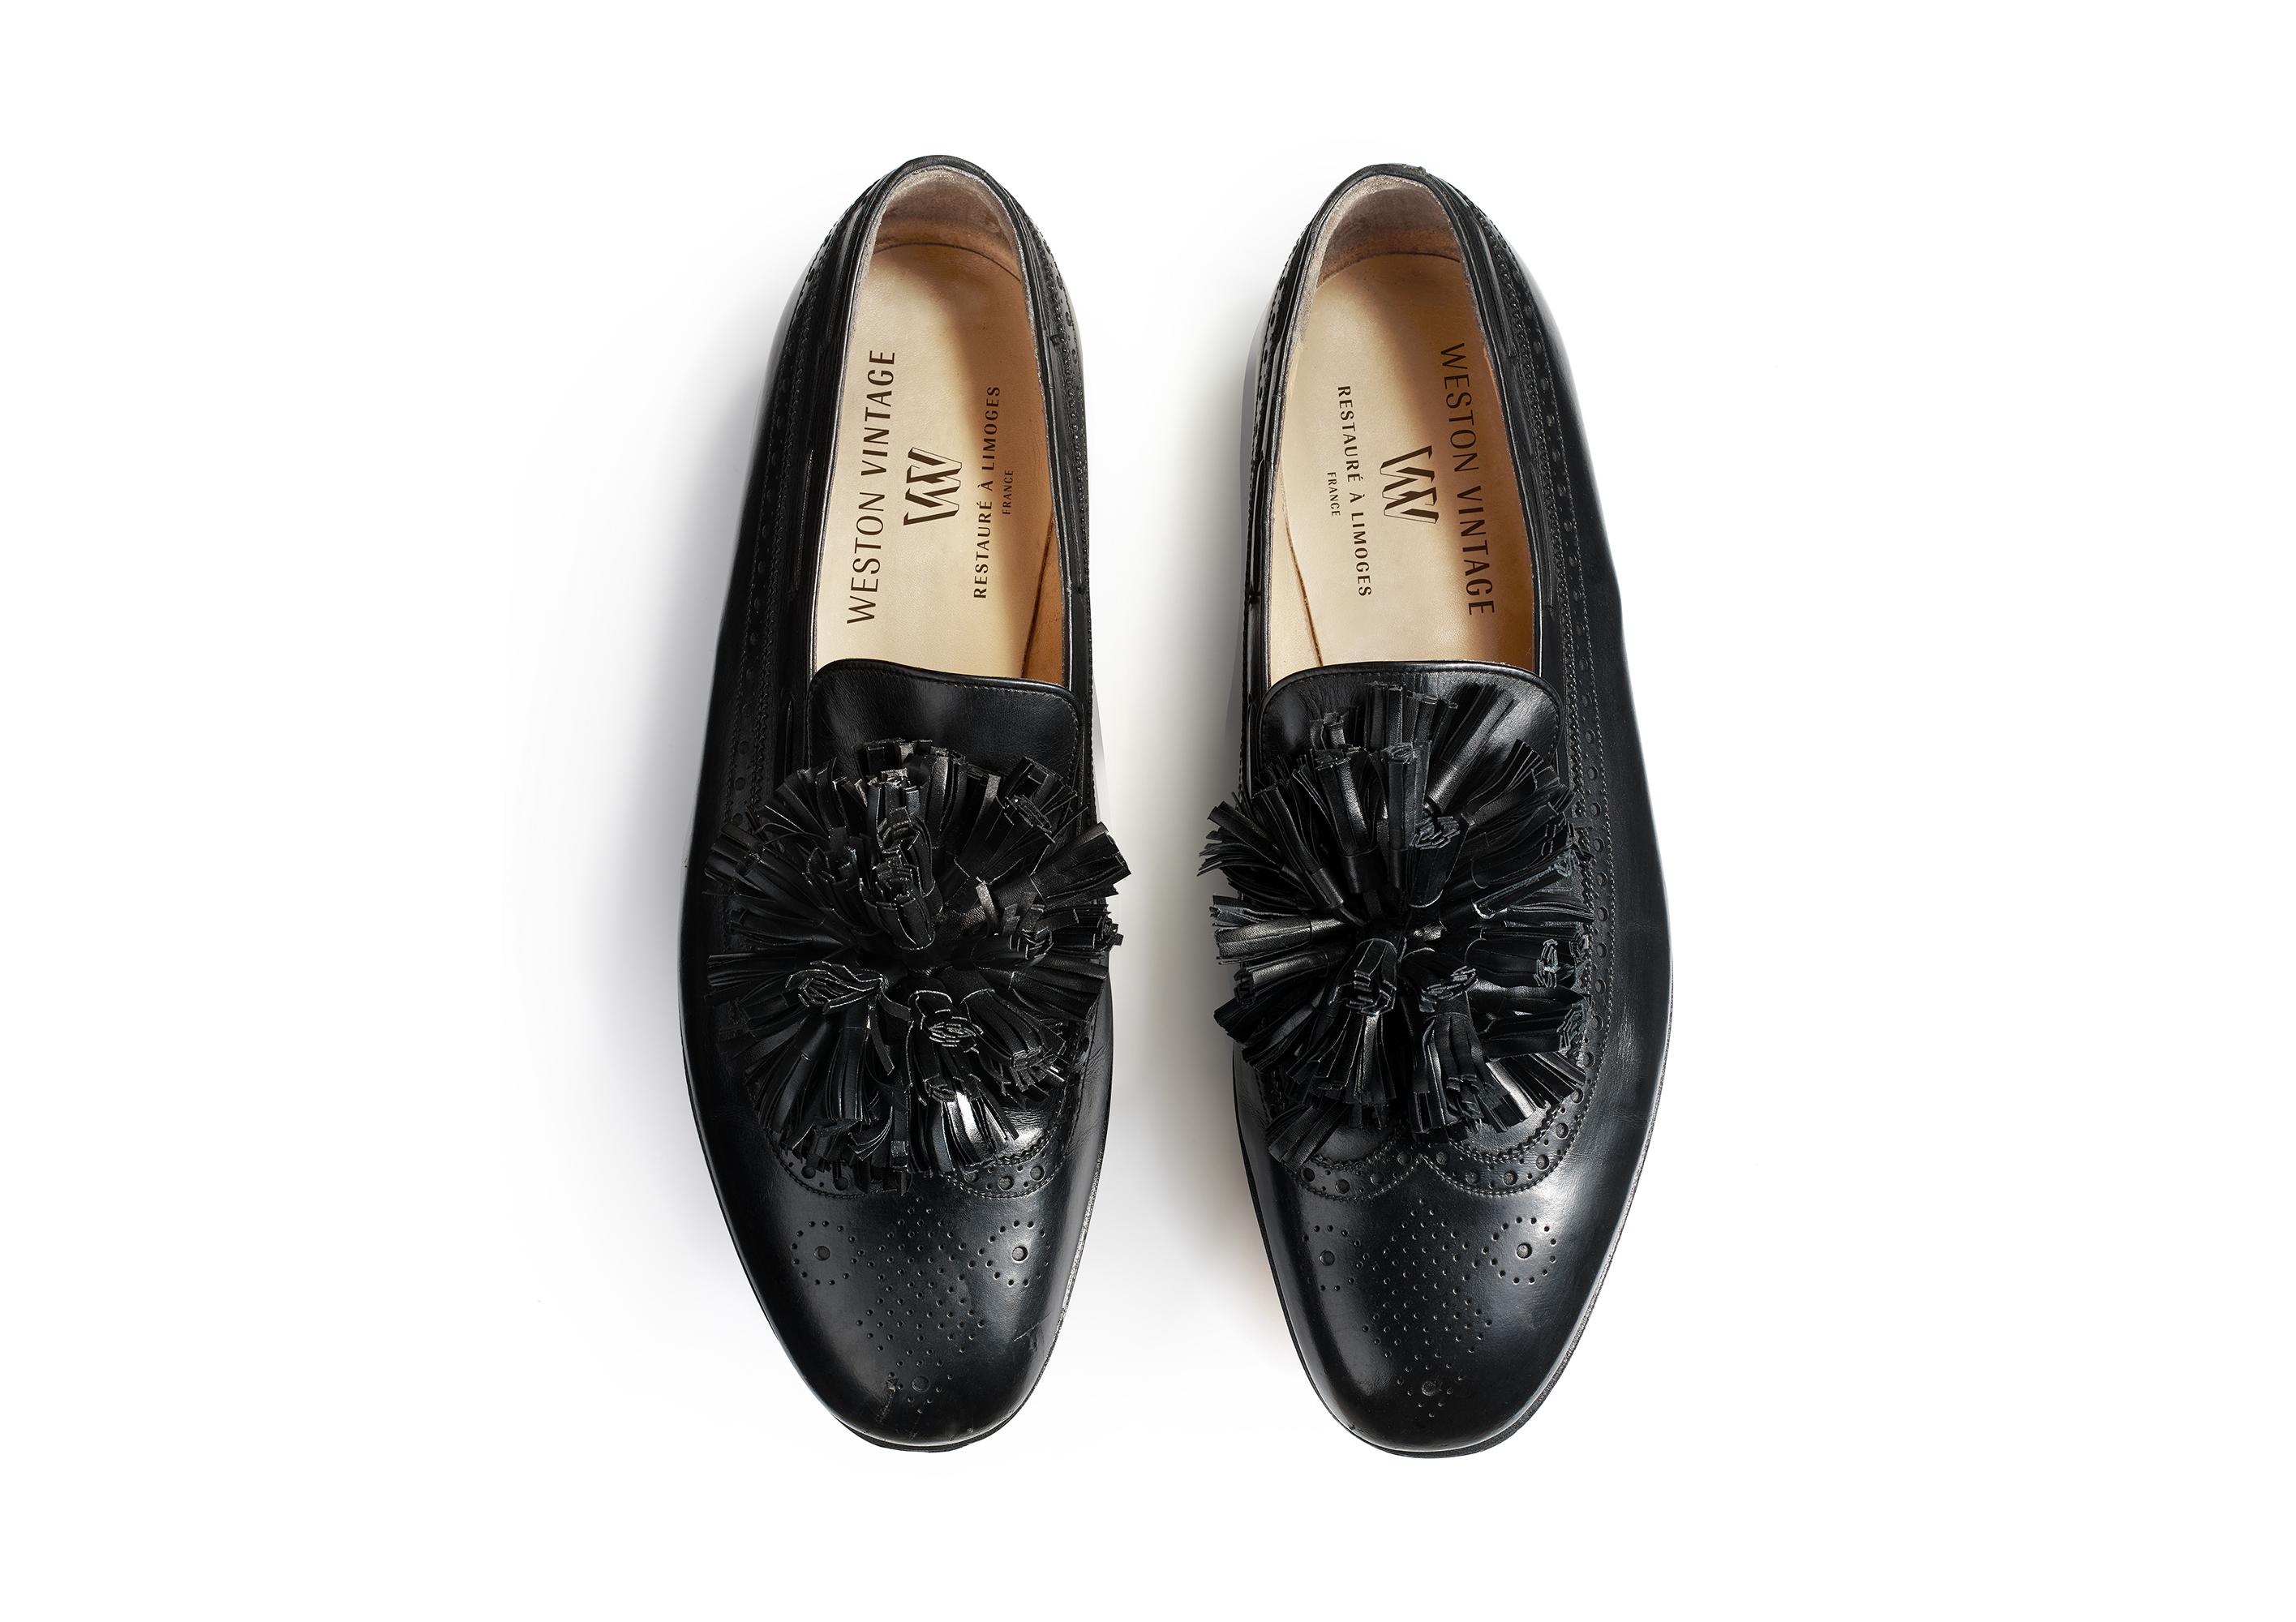 The customized Bartin Malanciaga shoe from the Weston Vintage line.